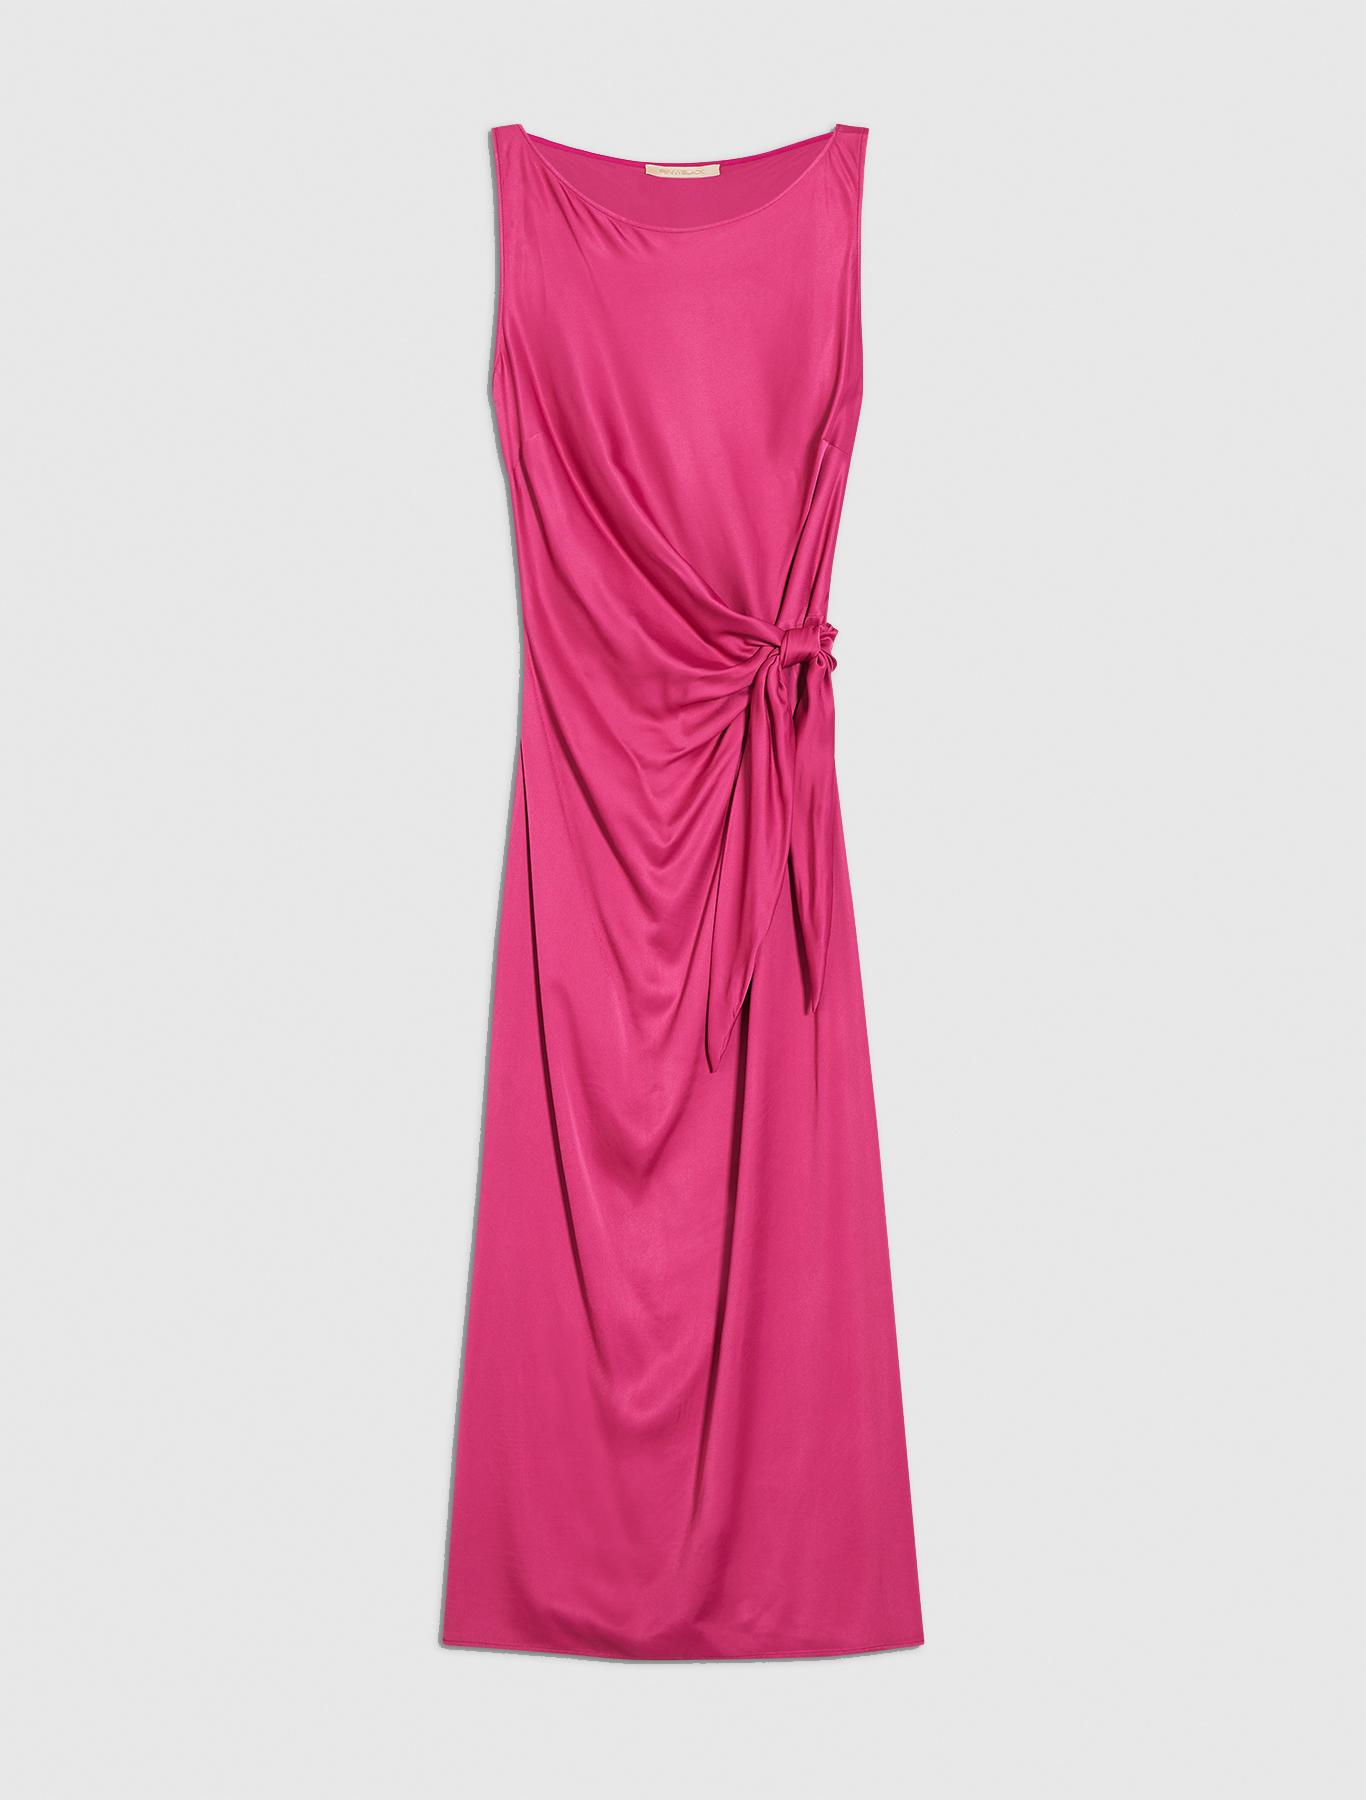 Long knotted satin dress - fuchsia - pennyblack